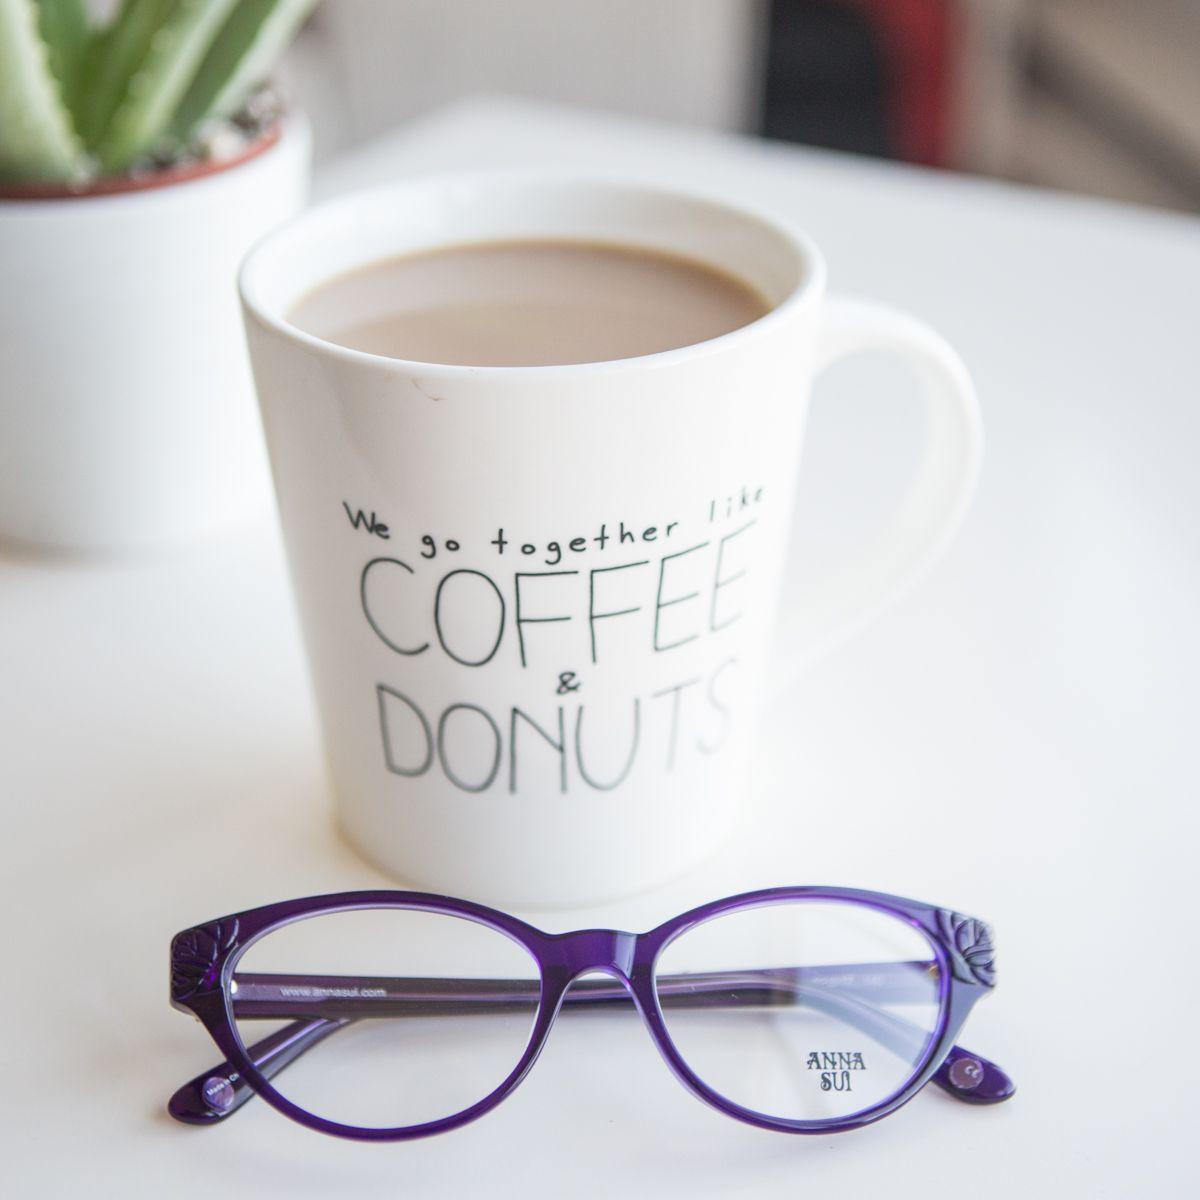 Anna Sui glasses   Coastal.com   Best of Instagram   Pinterest ...